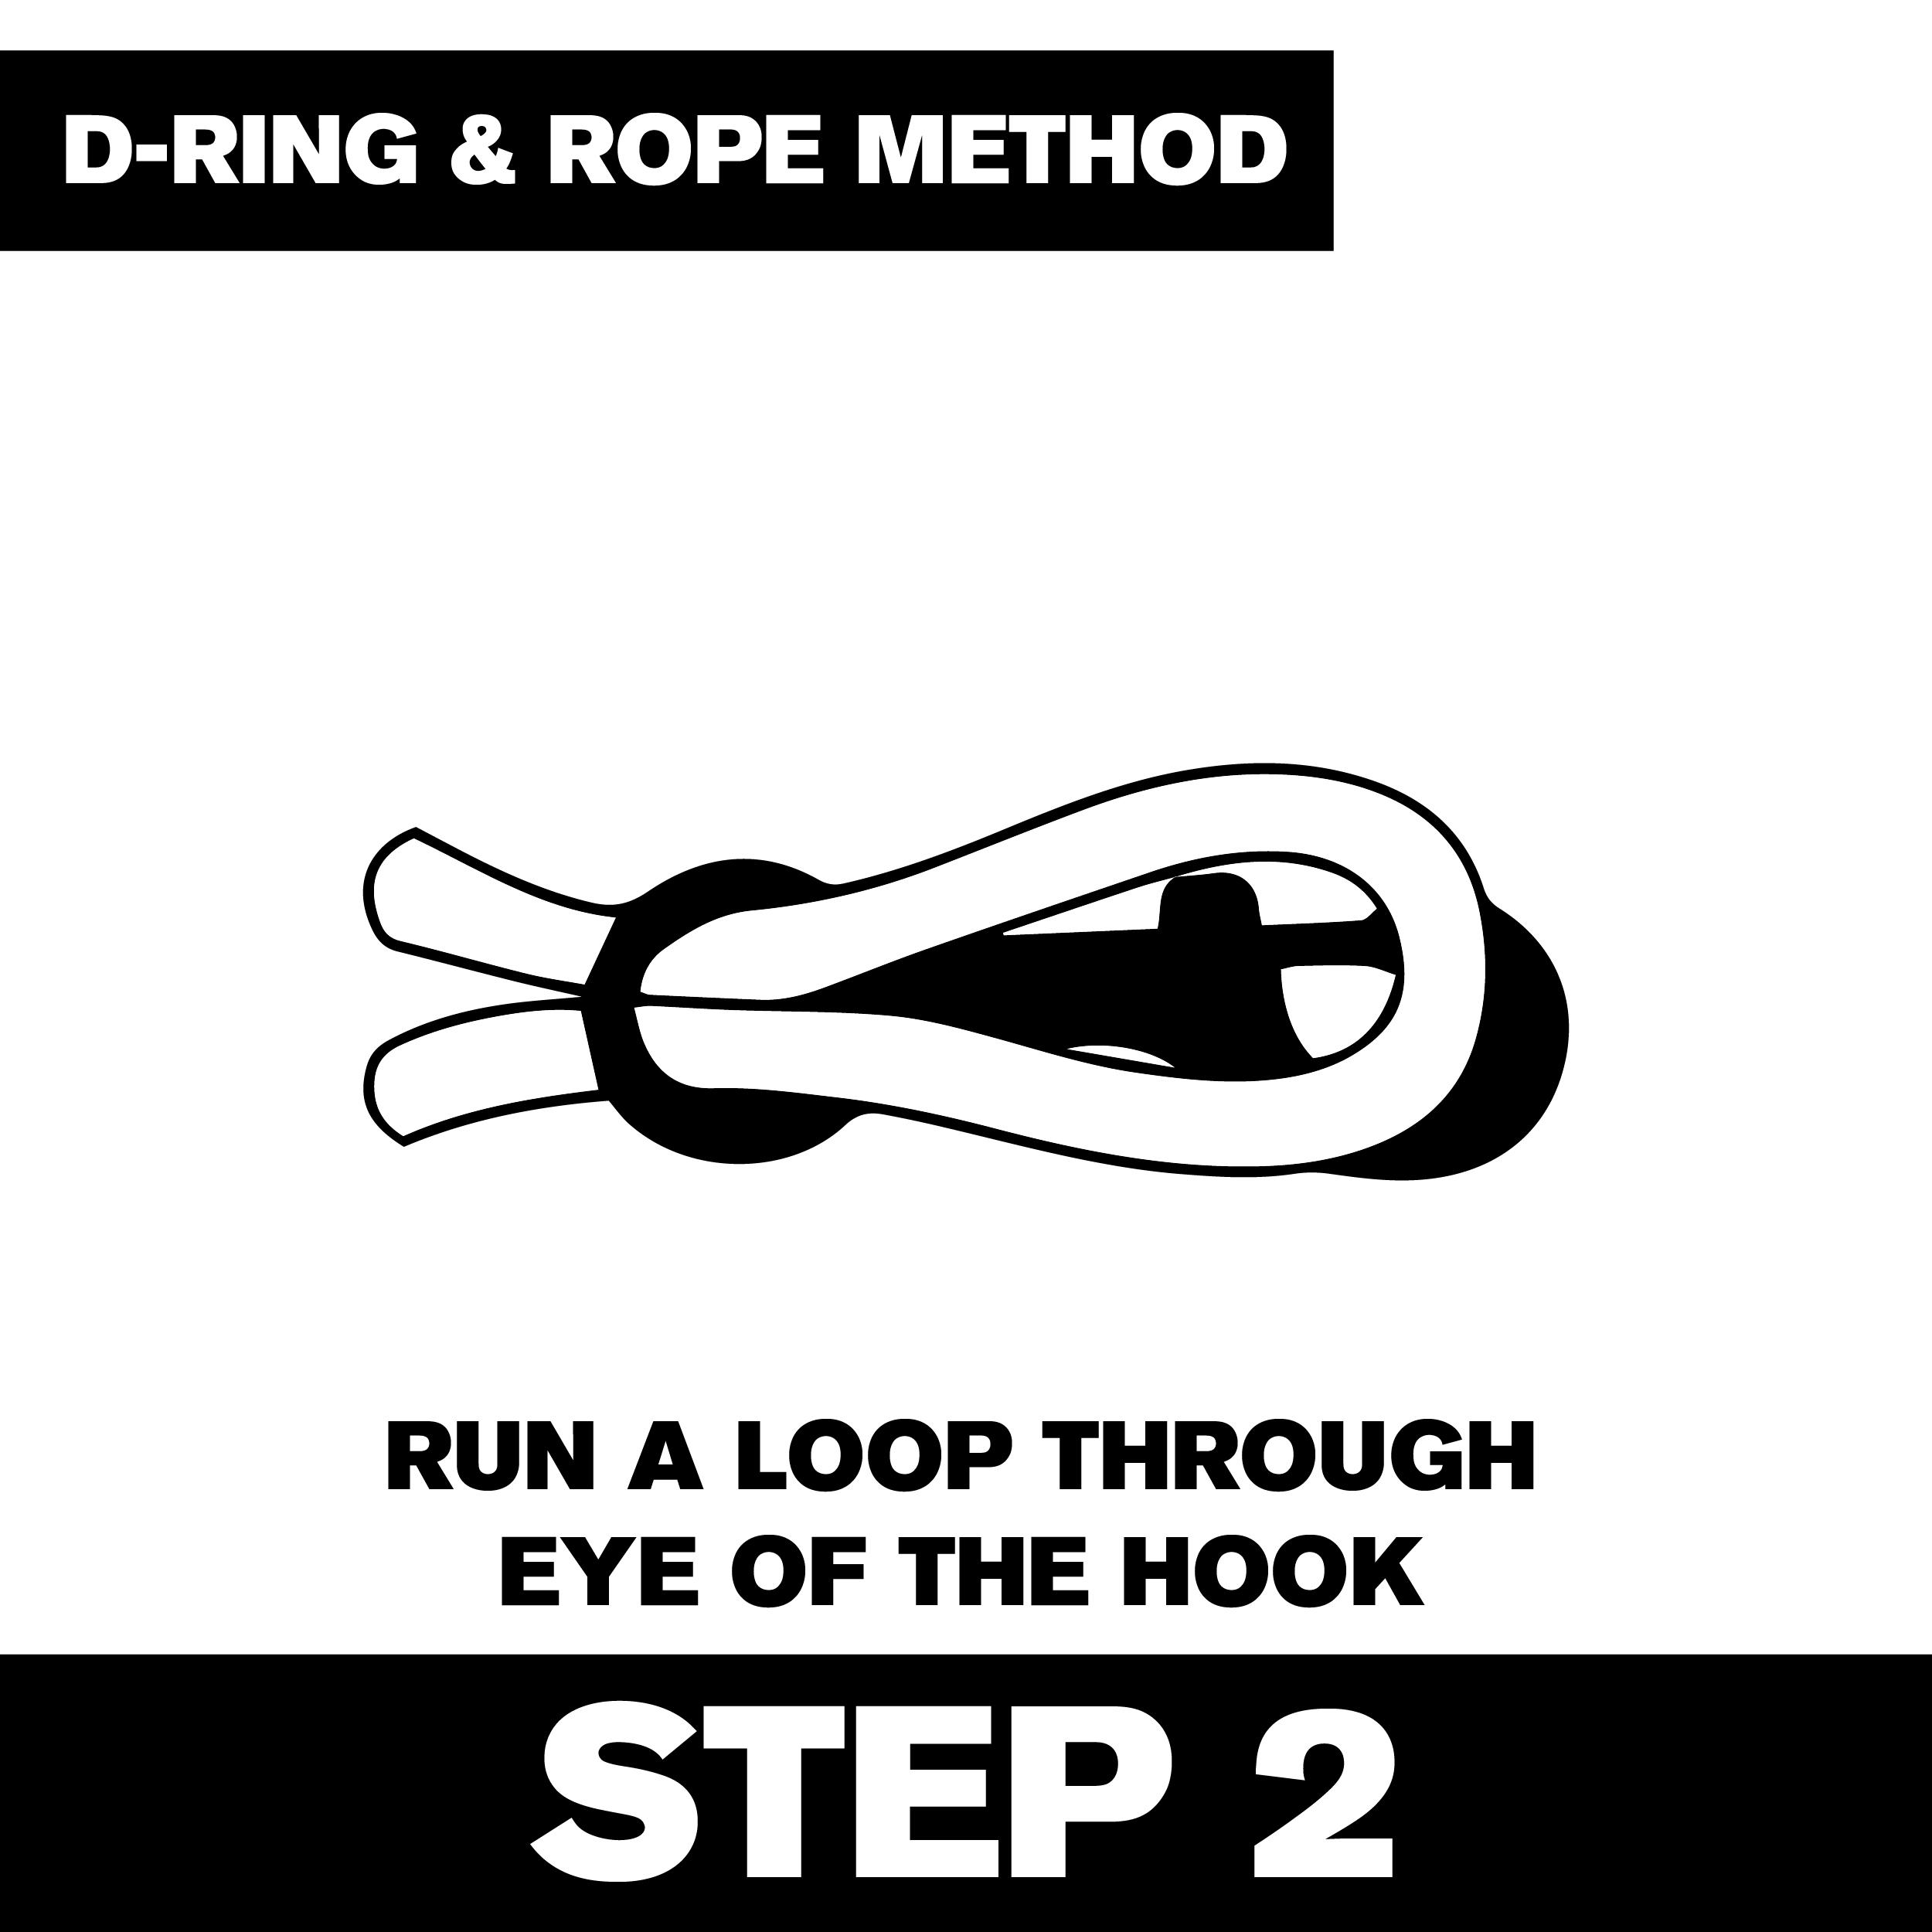 D-ring Step 2